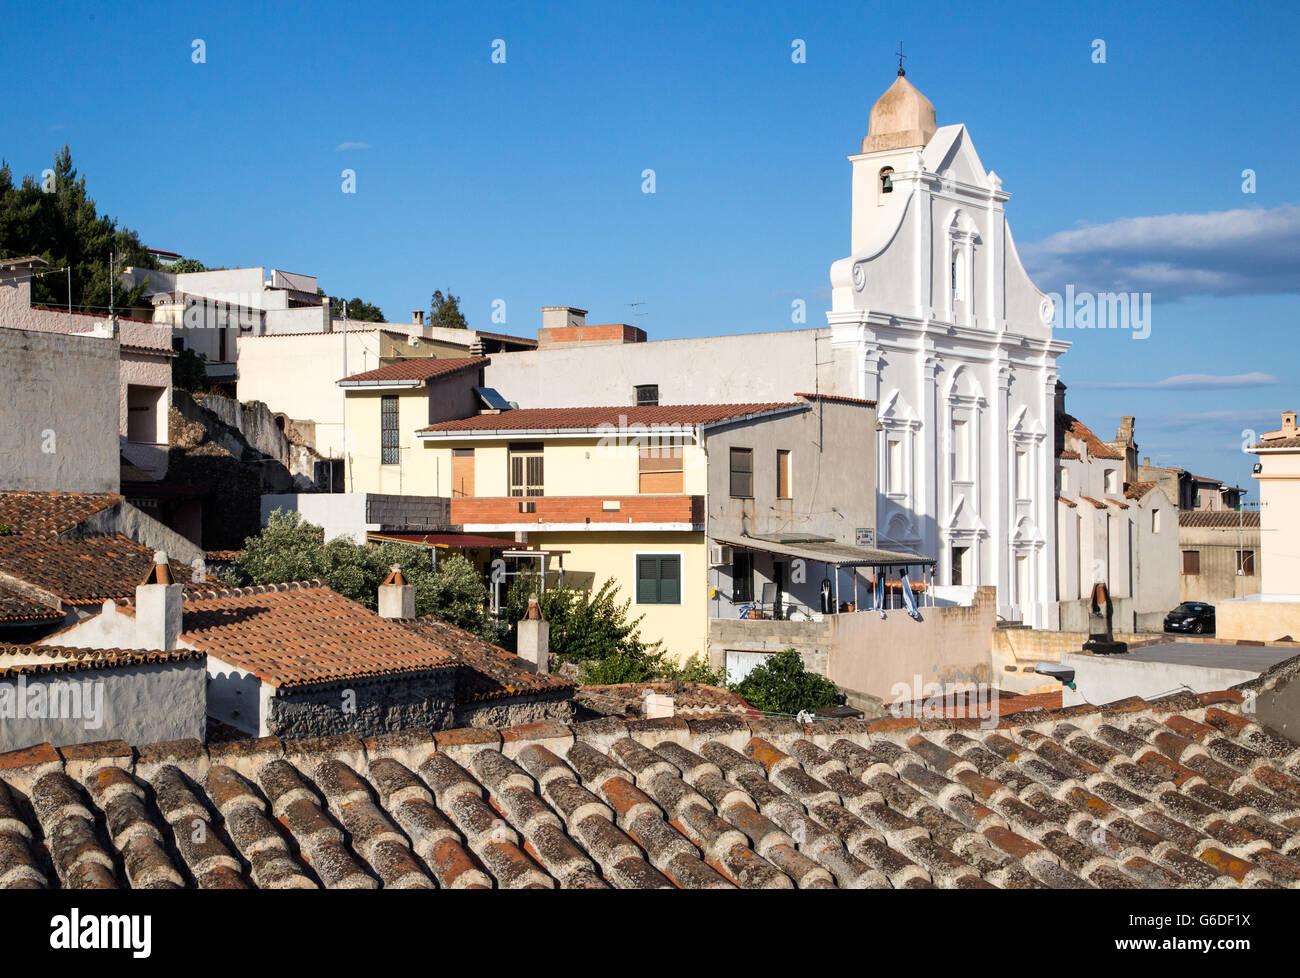 Kirche Chiesa Di San Giacomo-Orosei-Sardinien-Italien Stockbild